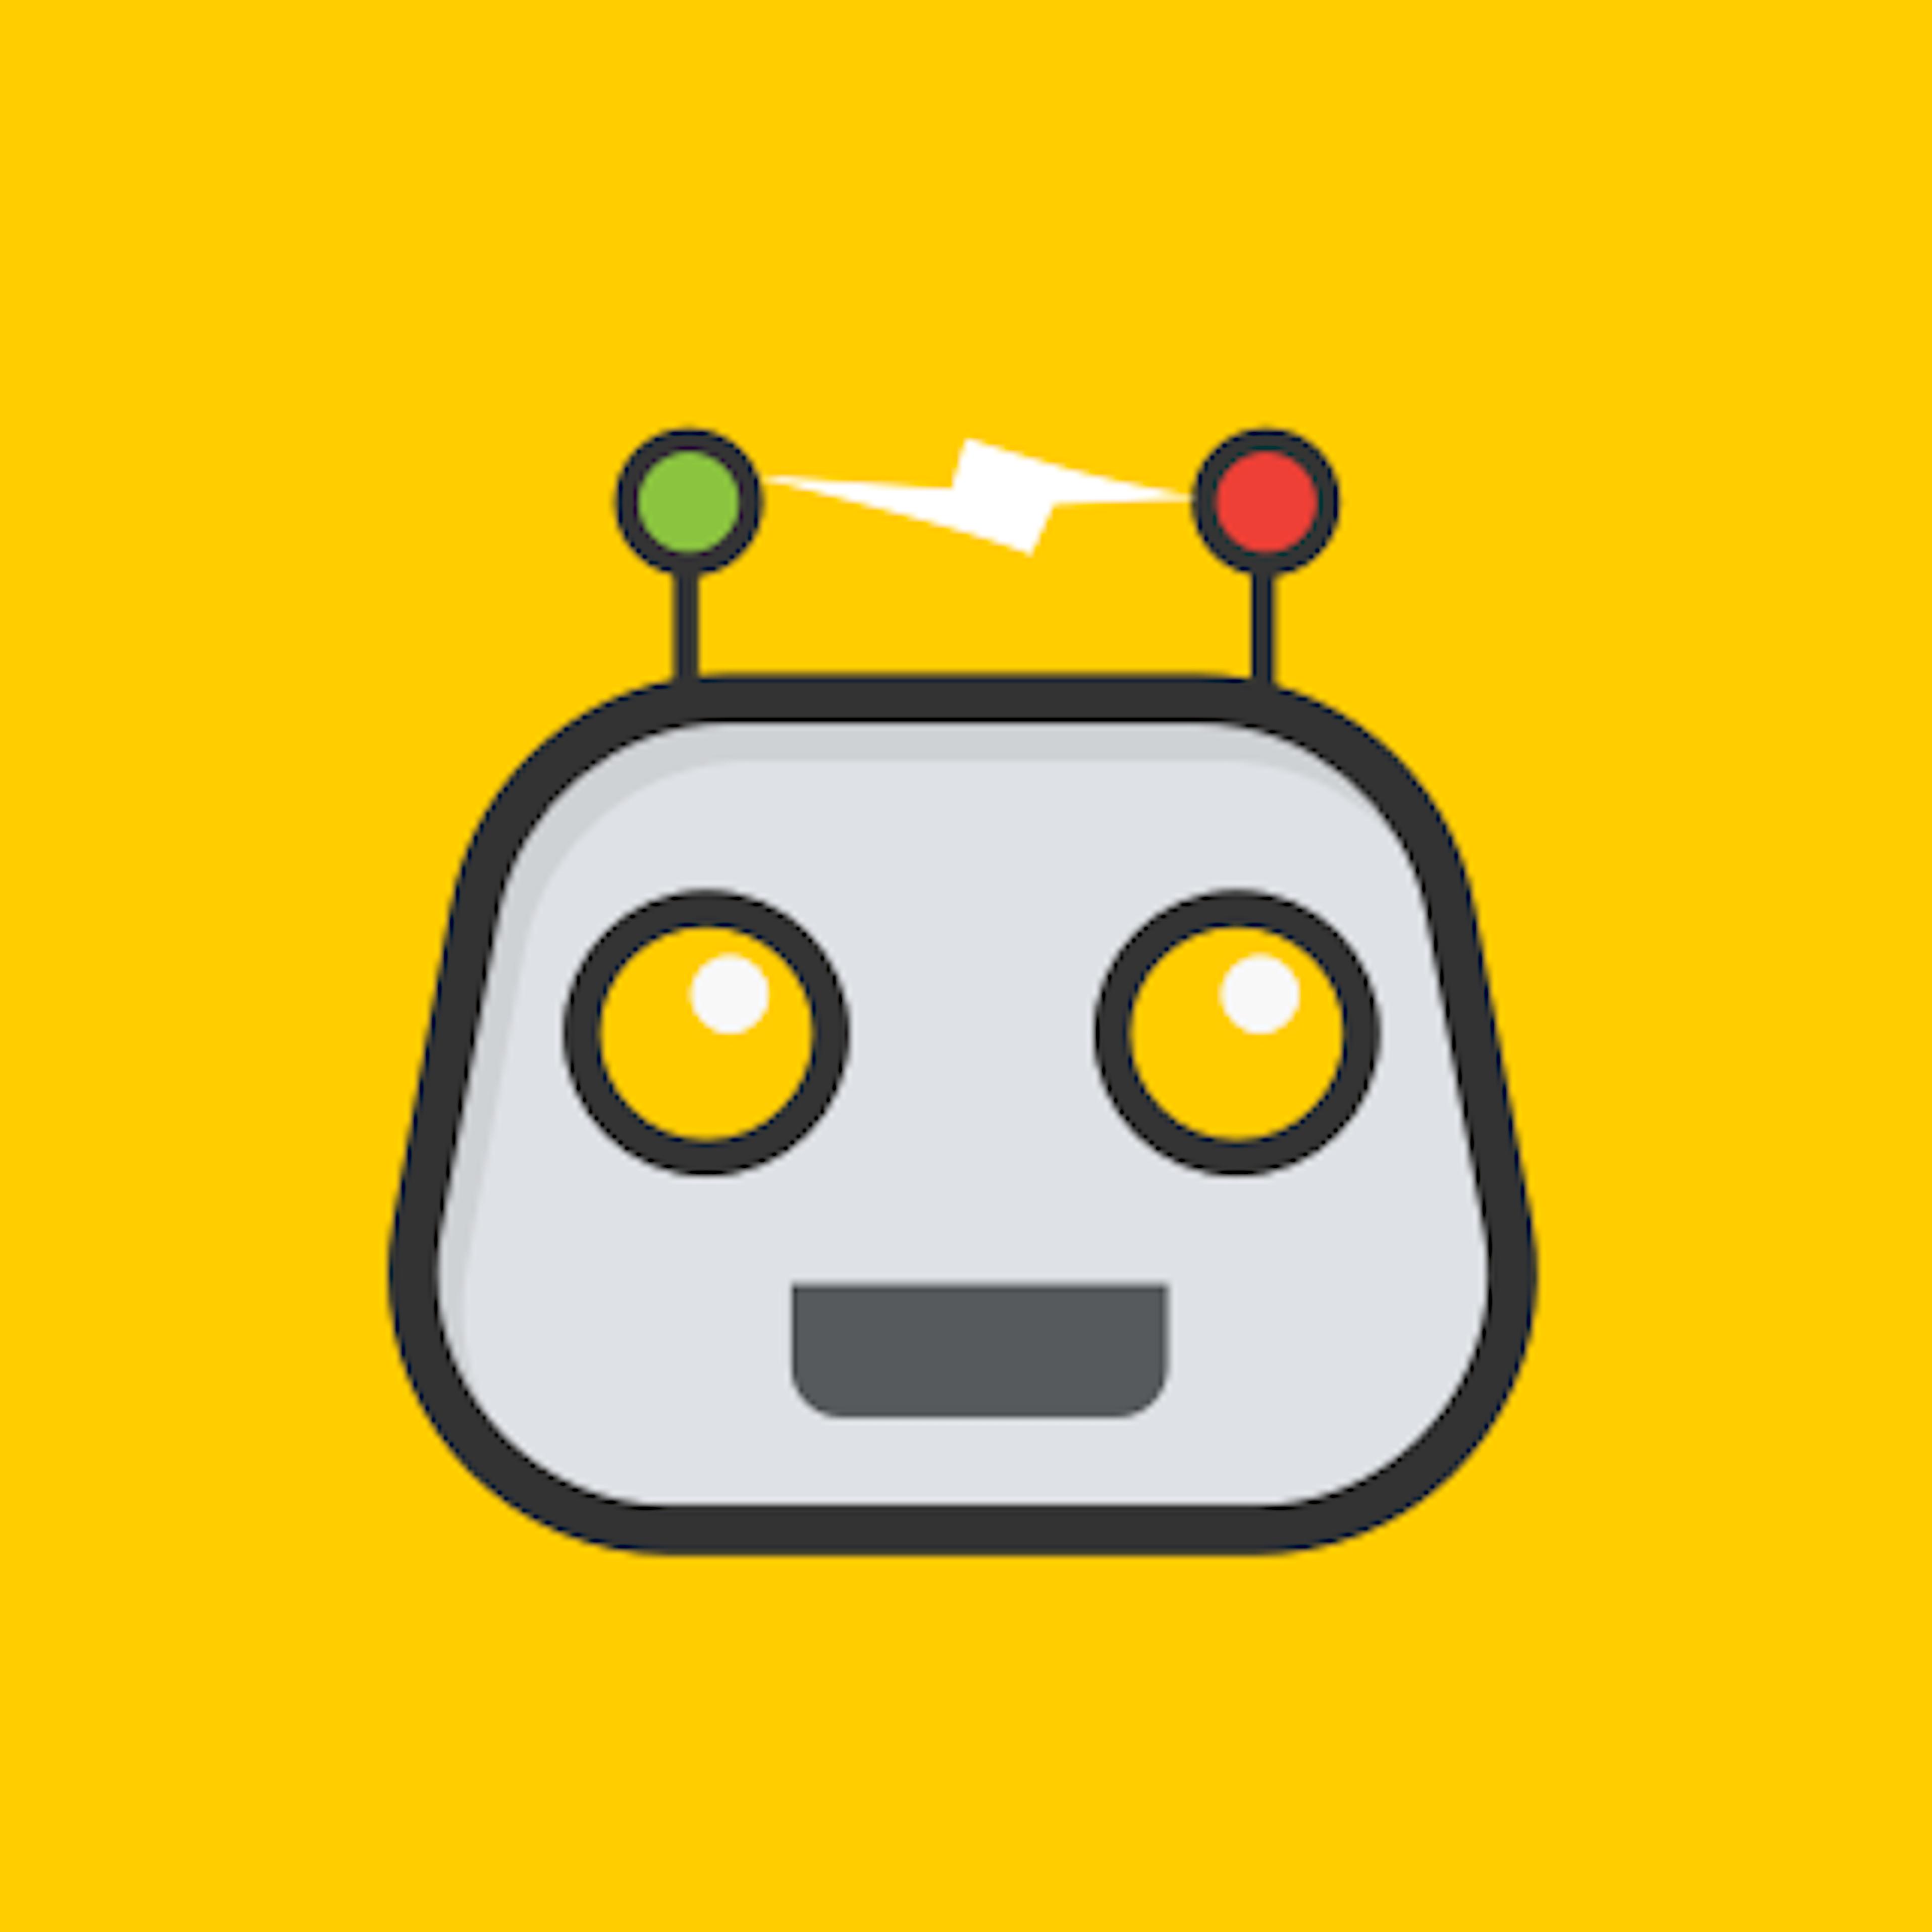 Meet Yellobot!